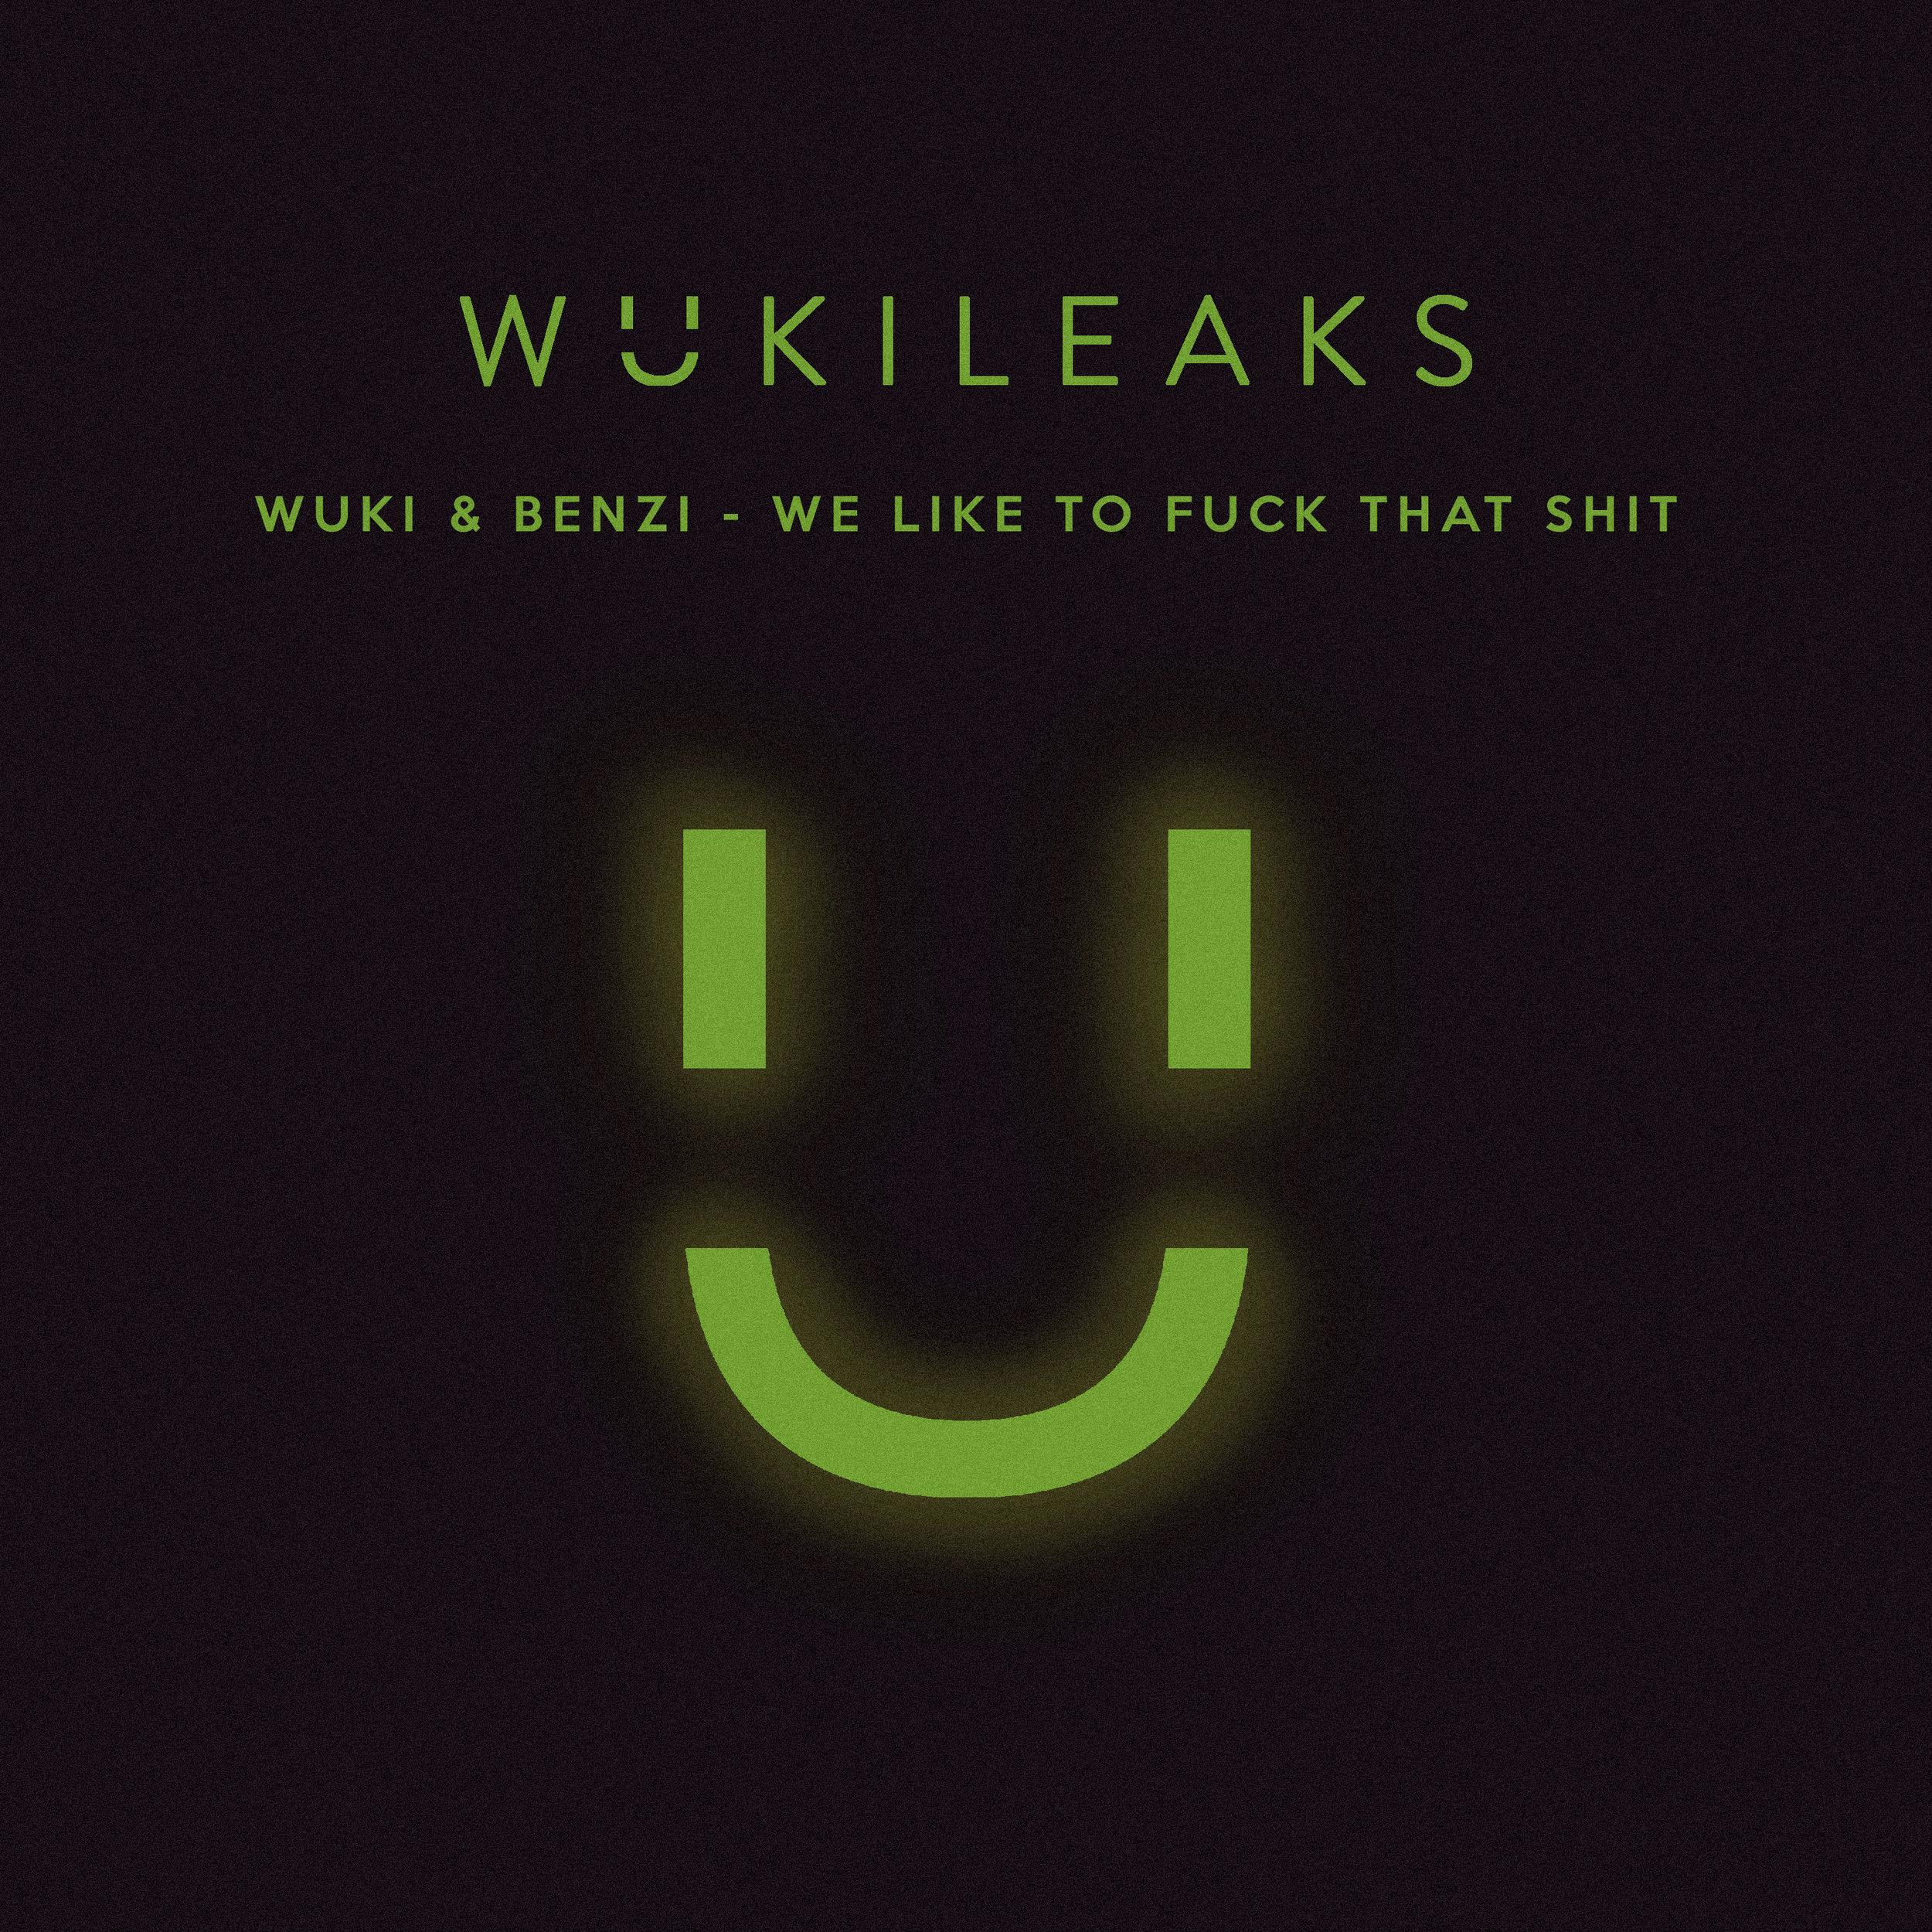 WUKILEAKS_ALBUM_ART_FTS.jpg